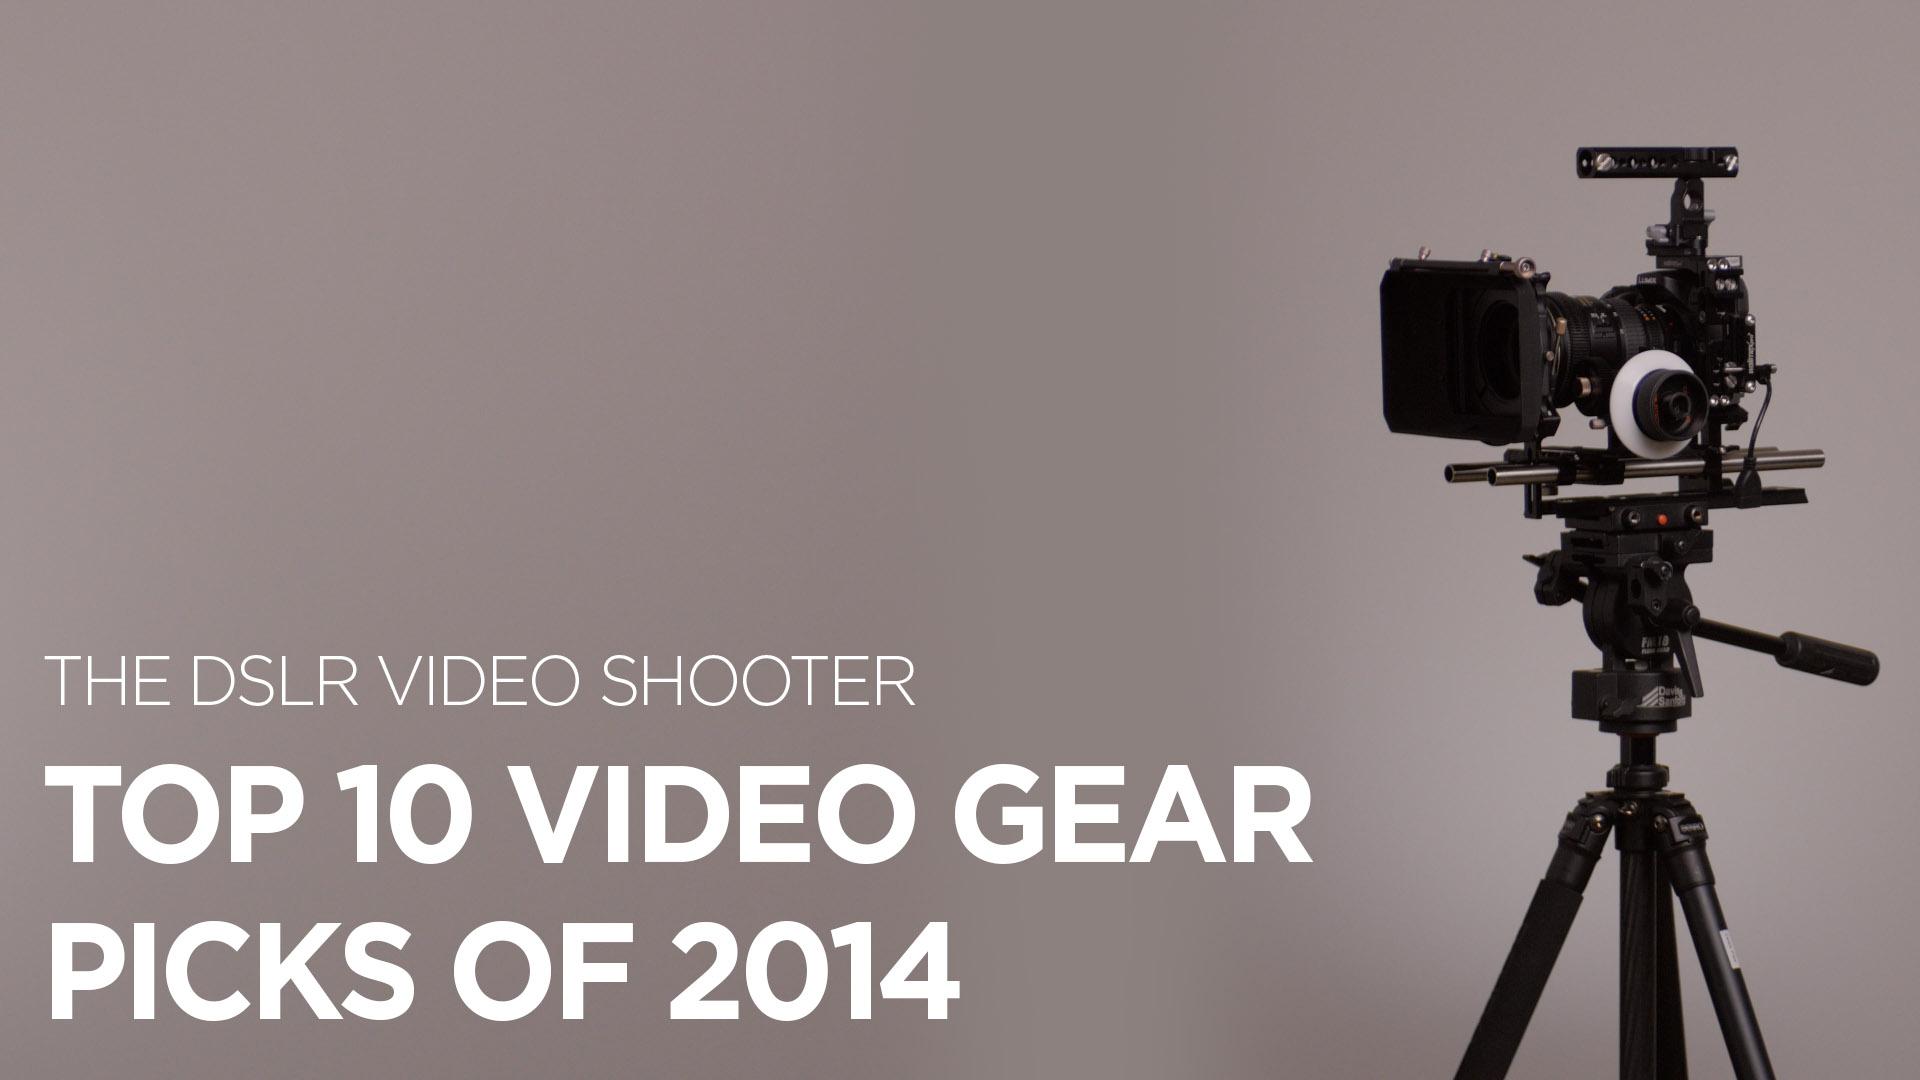 Top 10 Video Gear Picks of 2014